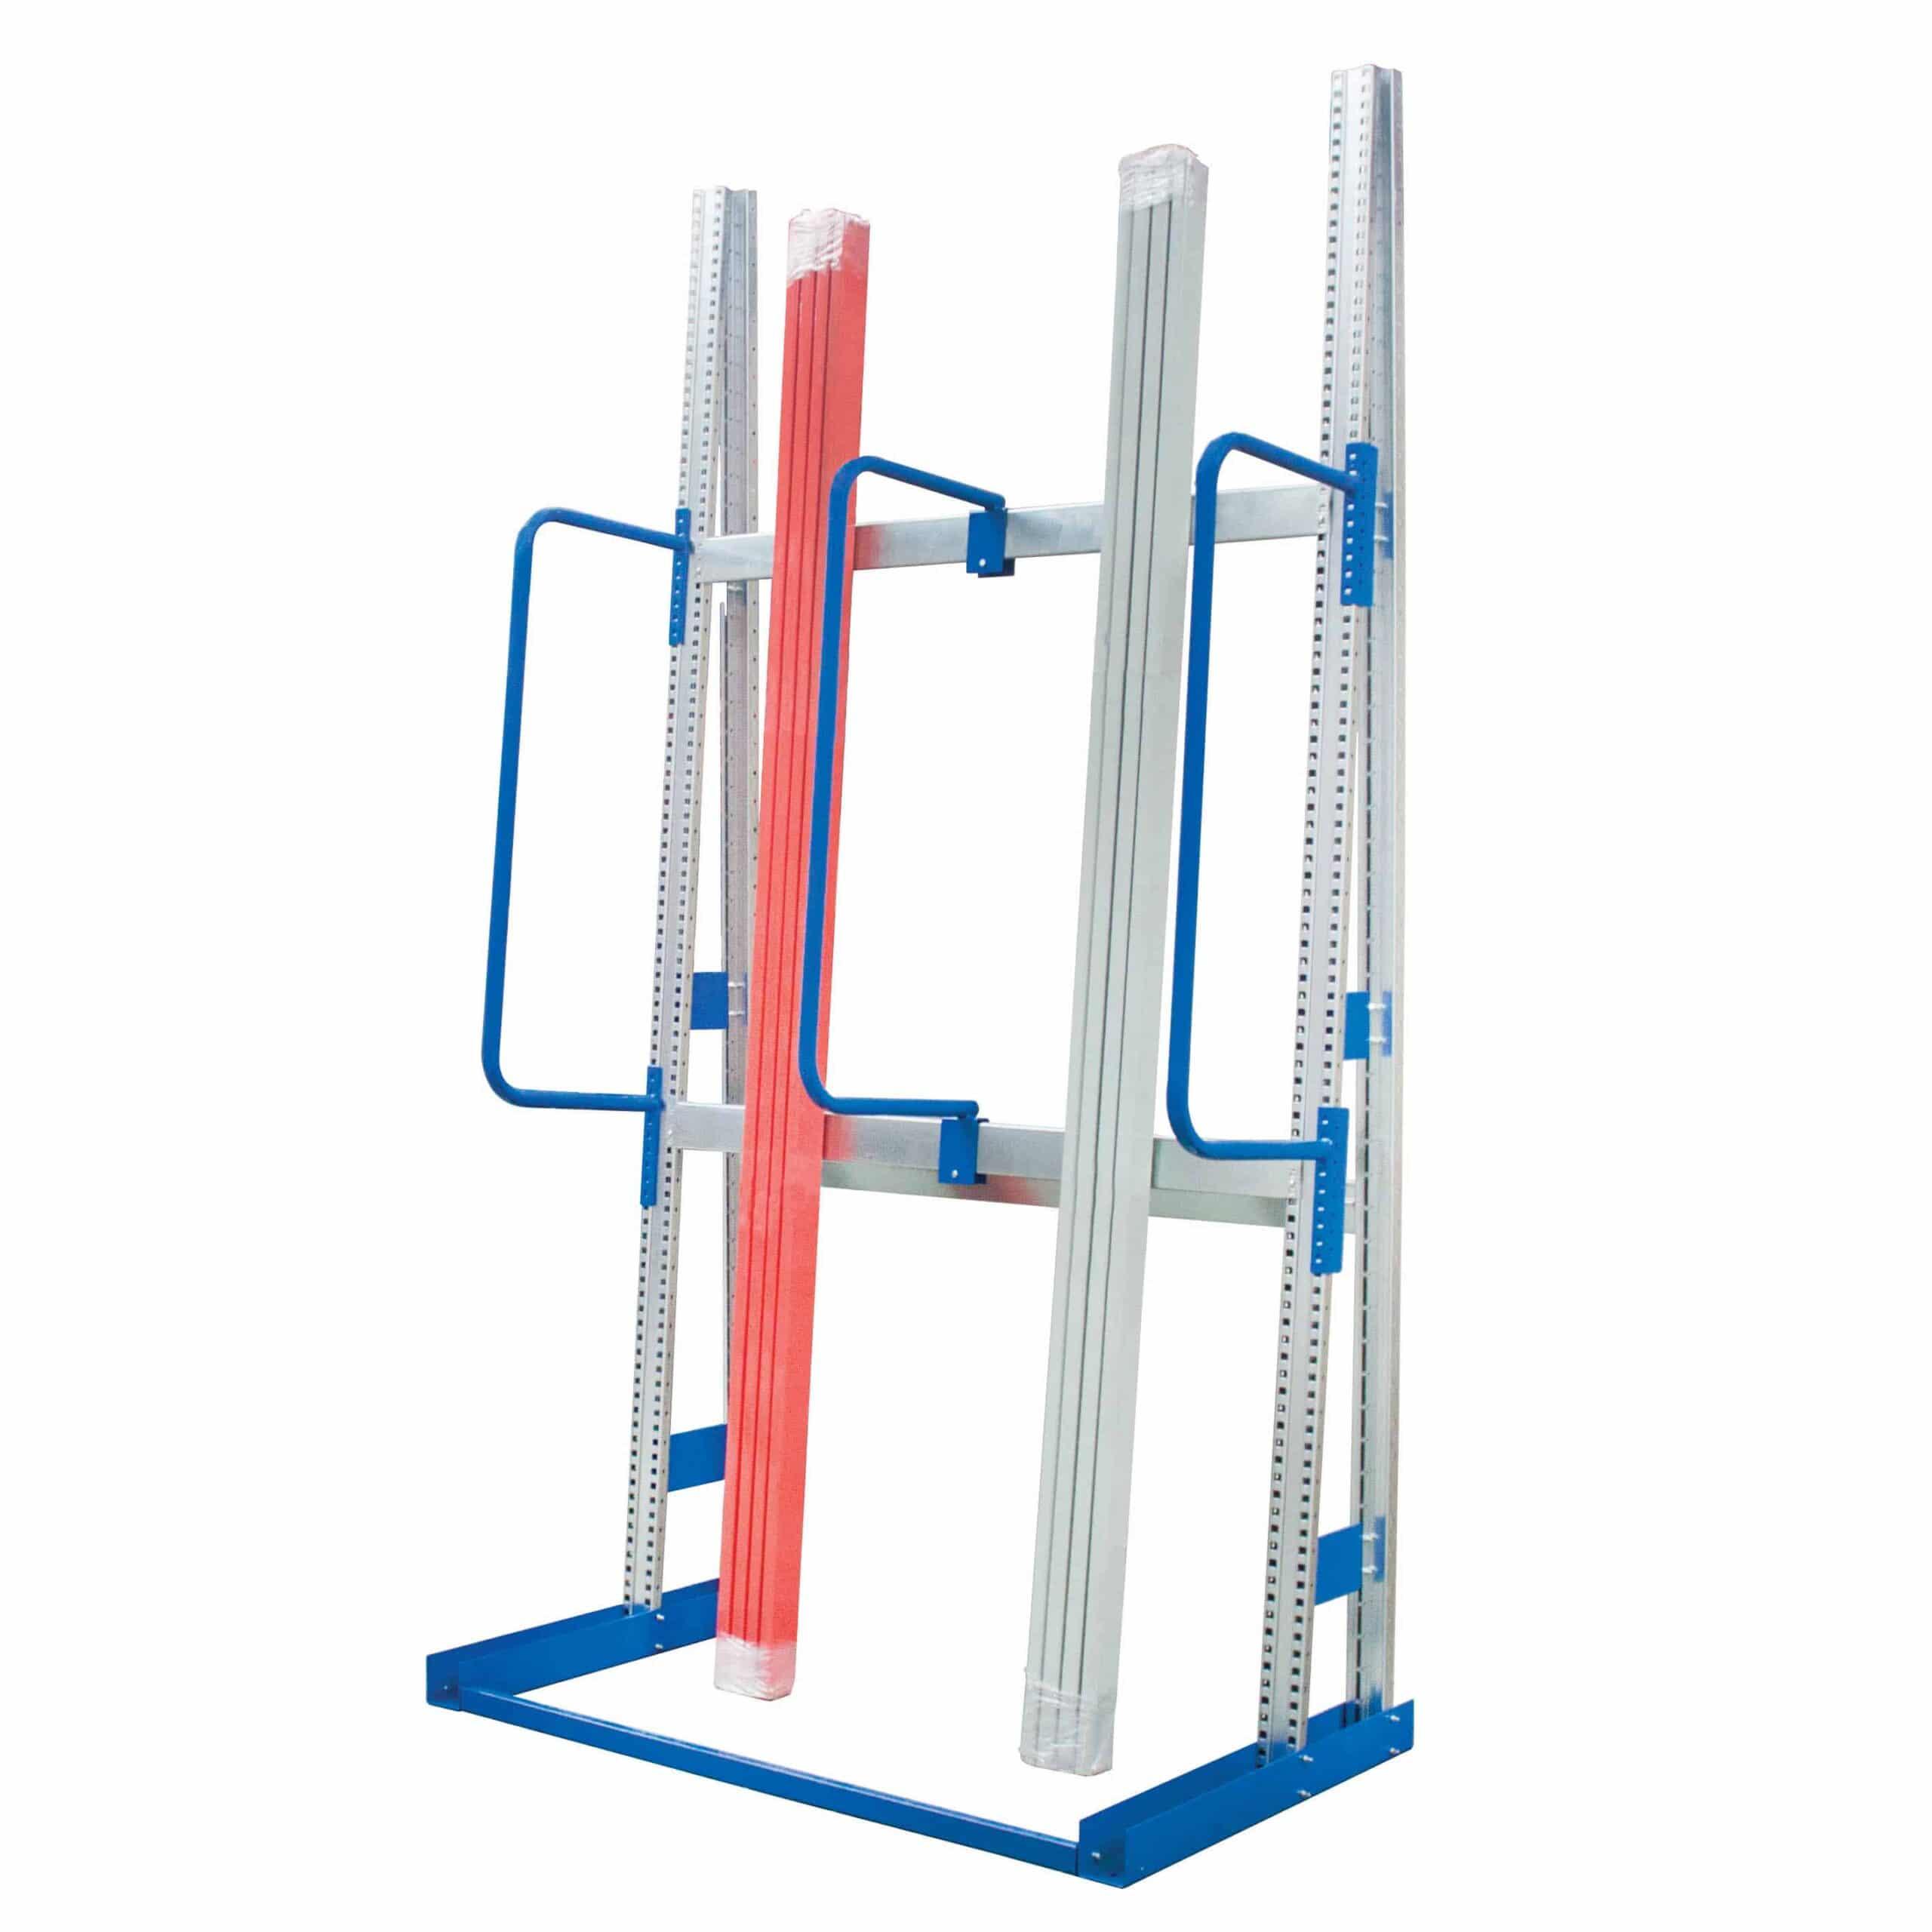 Adjustable Vertical Storage Racks